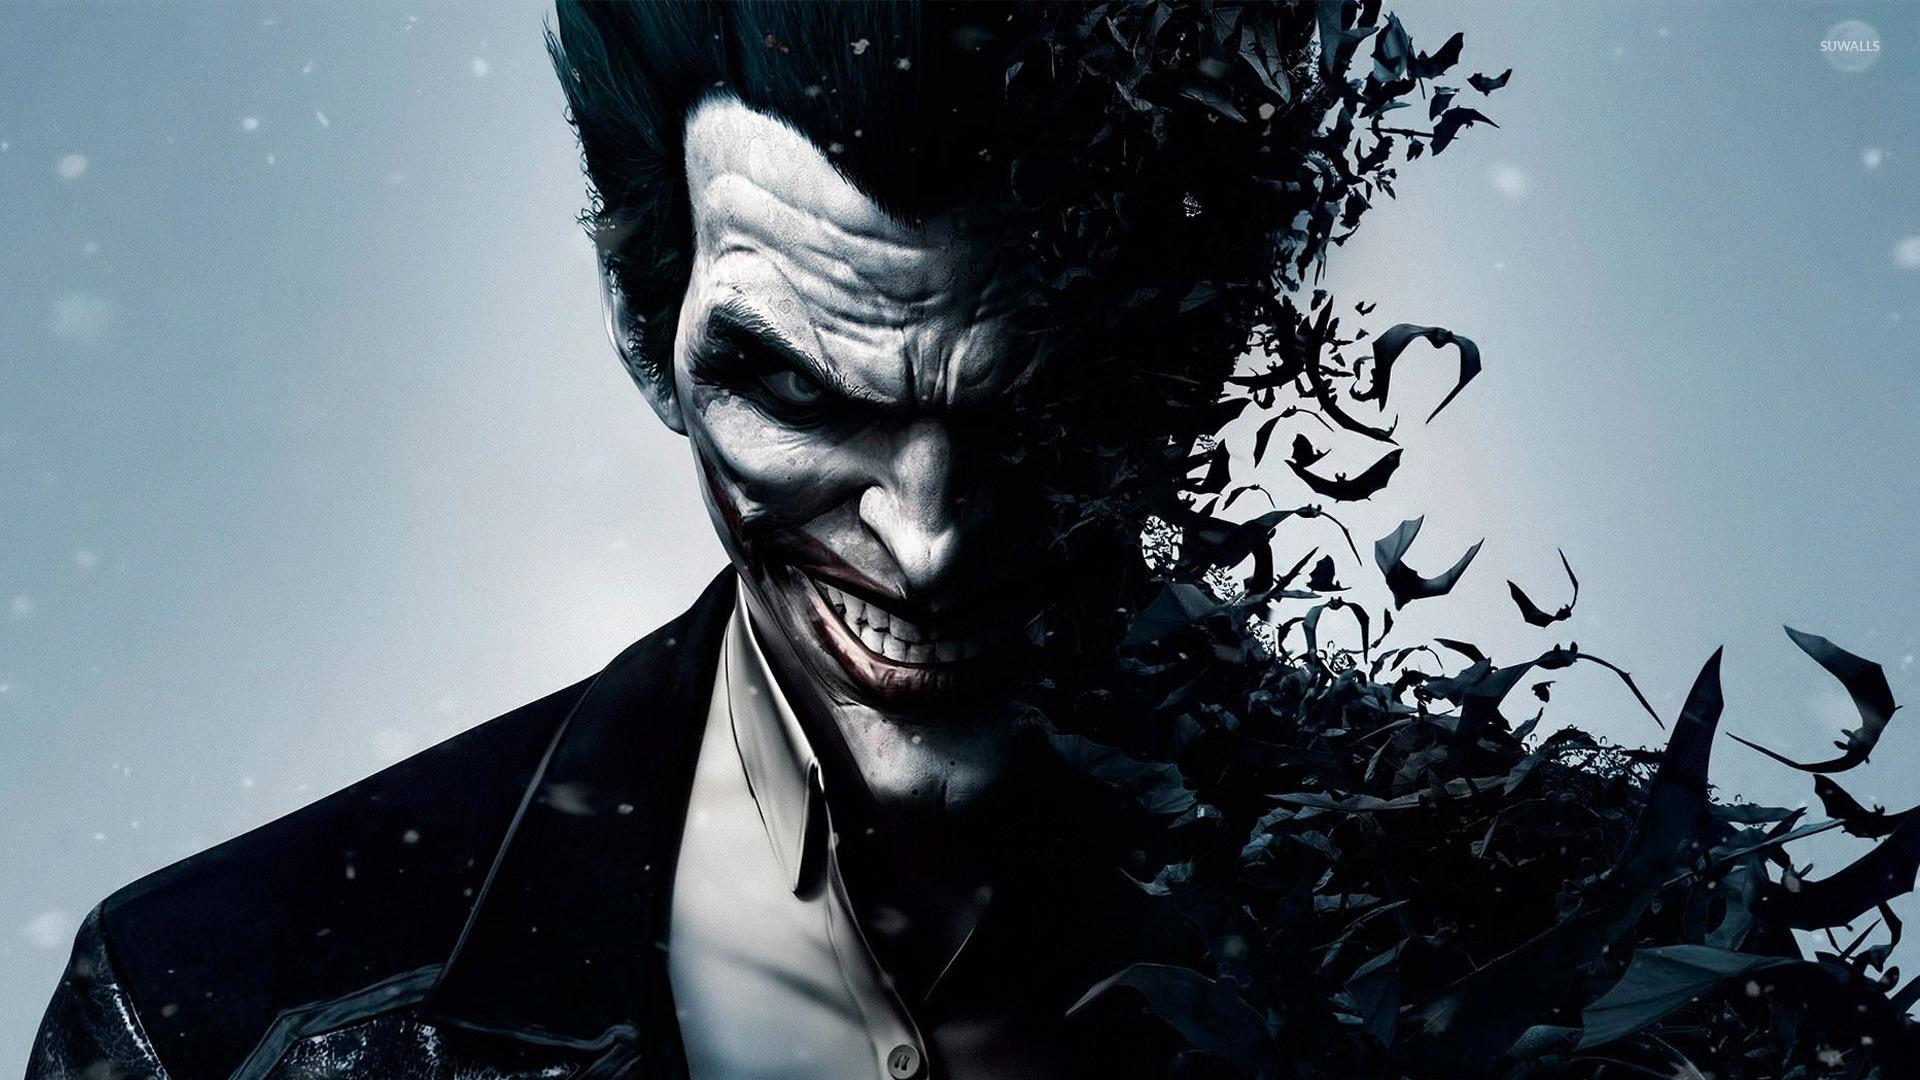 Joker   Batman   Arkham Origins wallpaper   Game wallpapers   27258 1920x1080